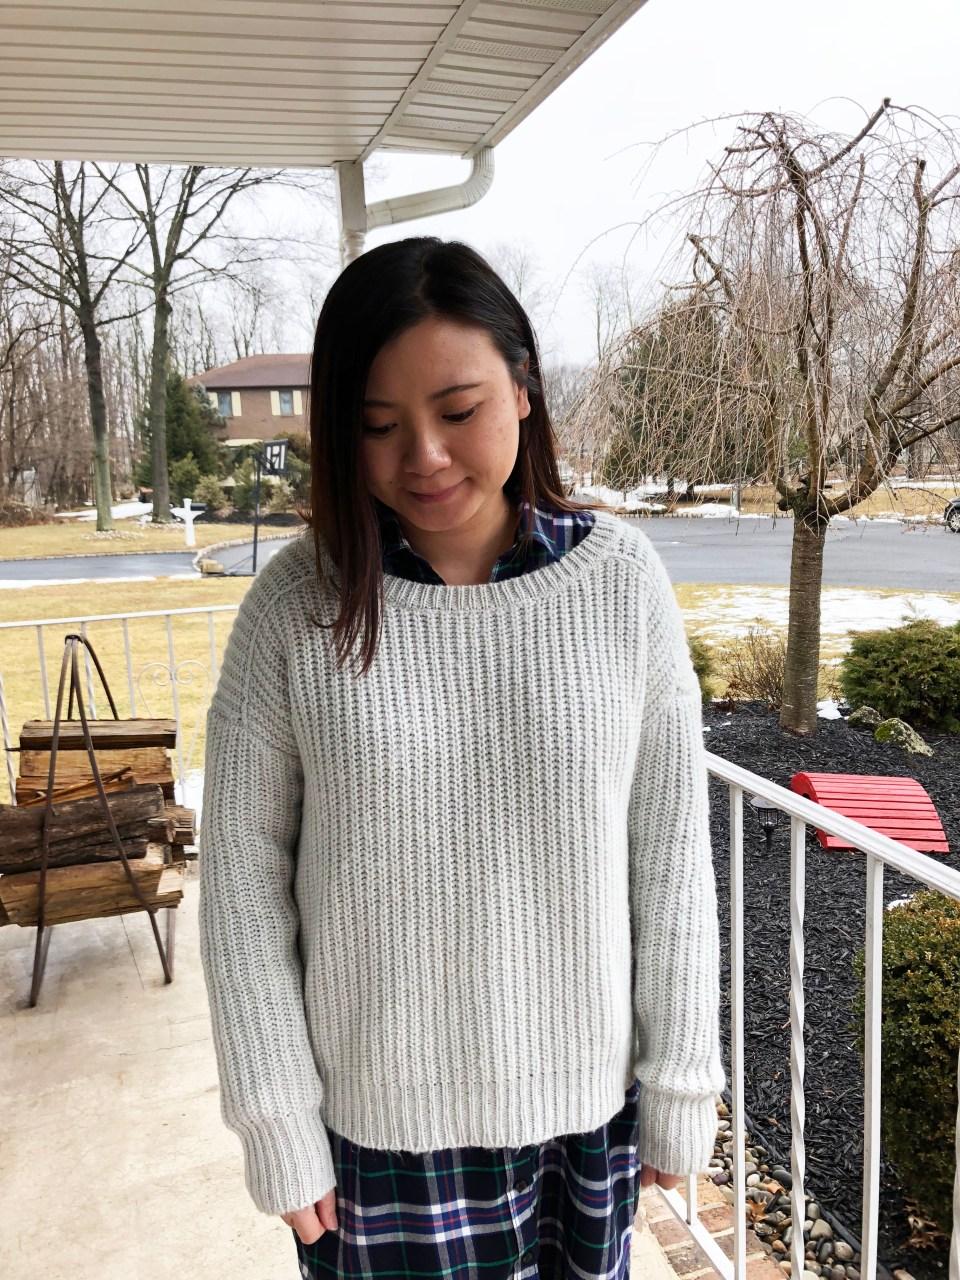 Shaker Knit Sweater + Plaid Shirt Dress 9